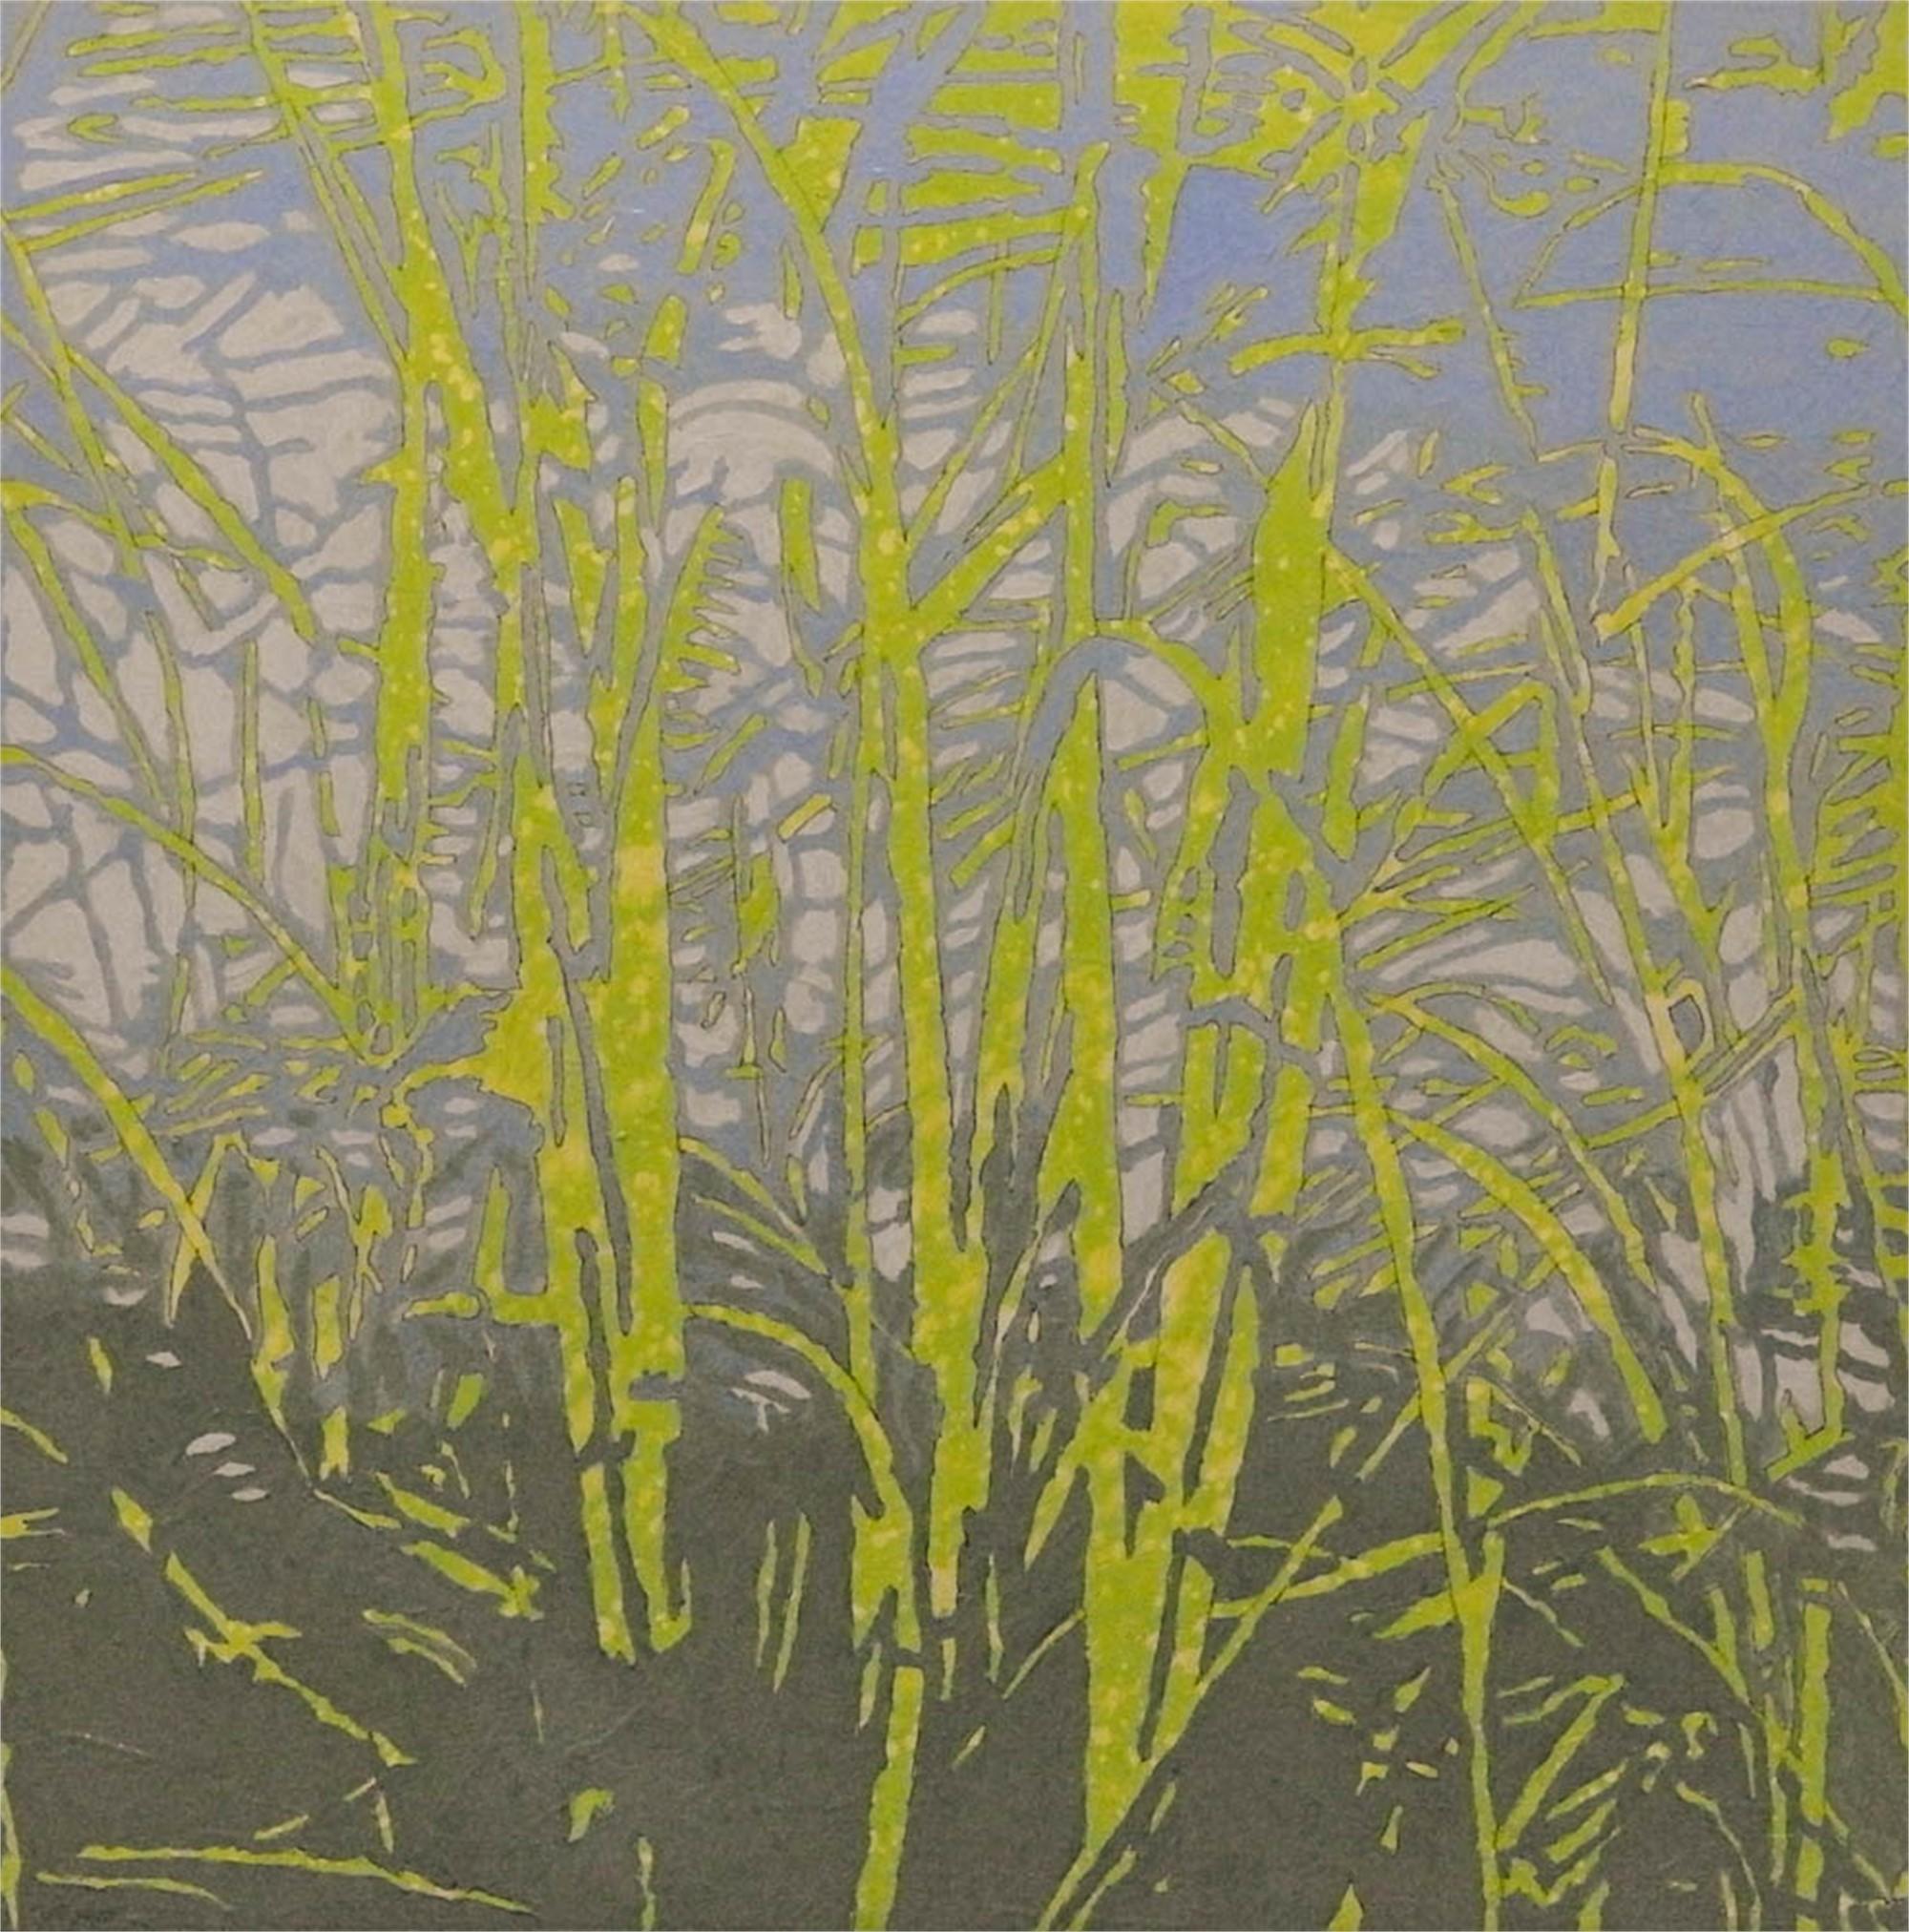 Marsh Tangle by John Townsend